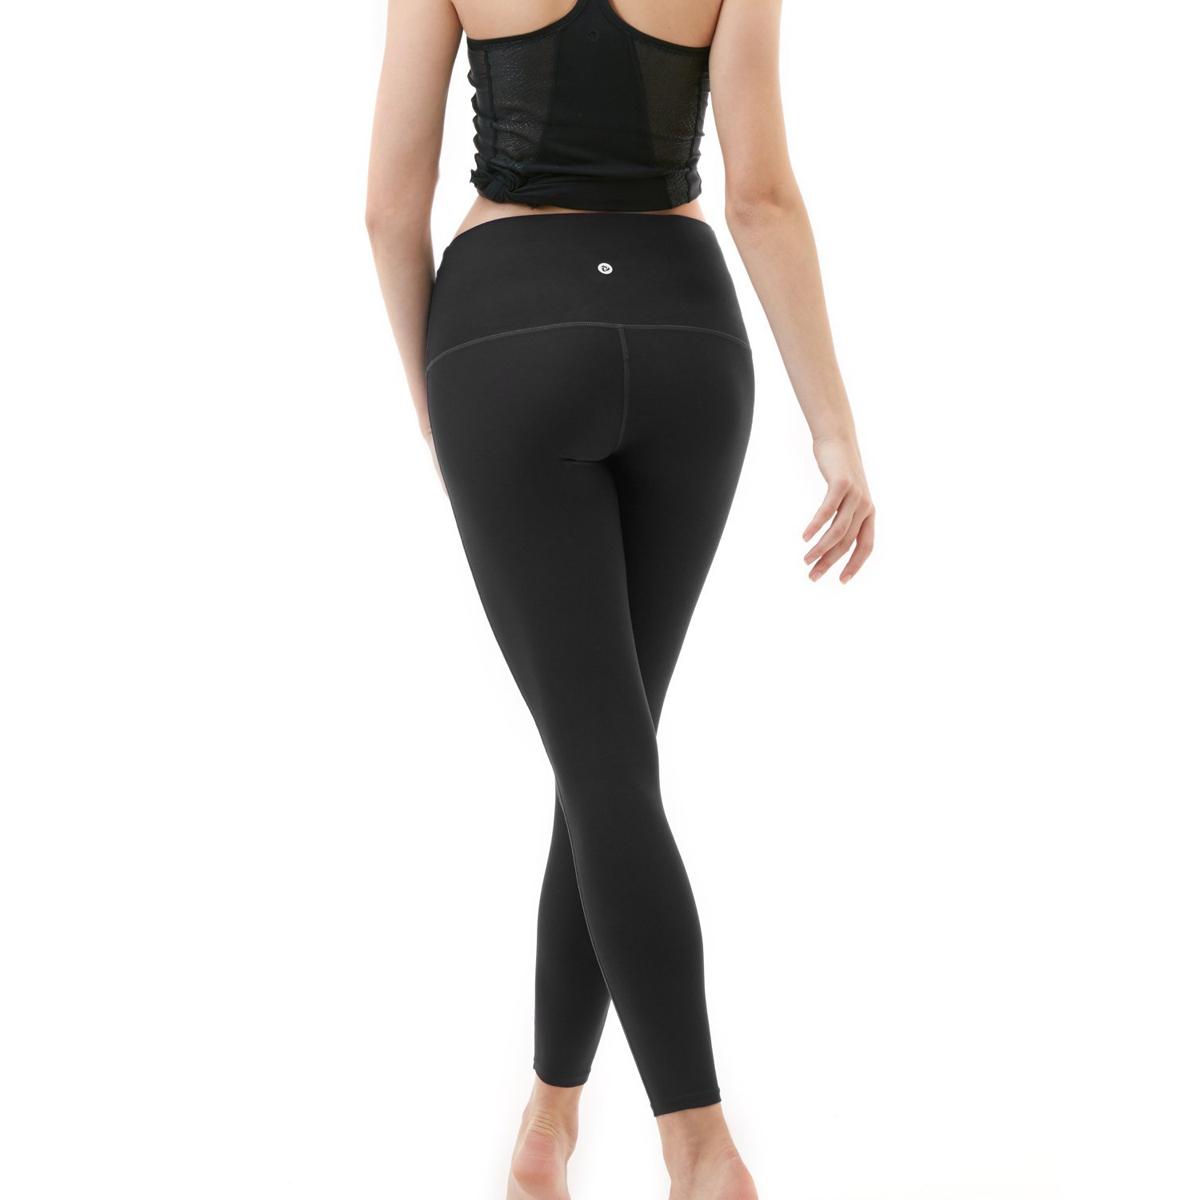 thumbnail 22 - TSLA Tesla FYP42 Women's High-Waisted Ultra-Stretch Tummy Control Yoga Pants